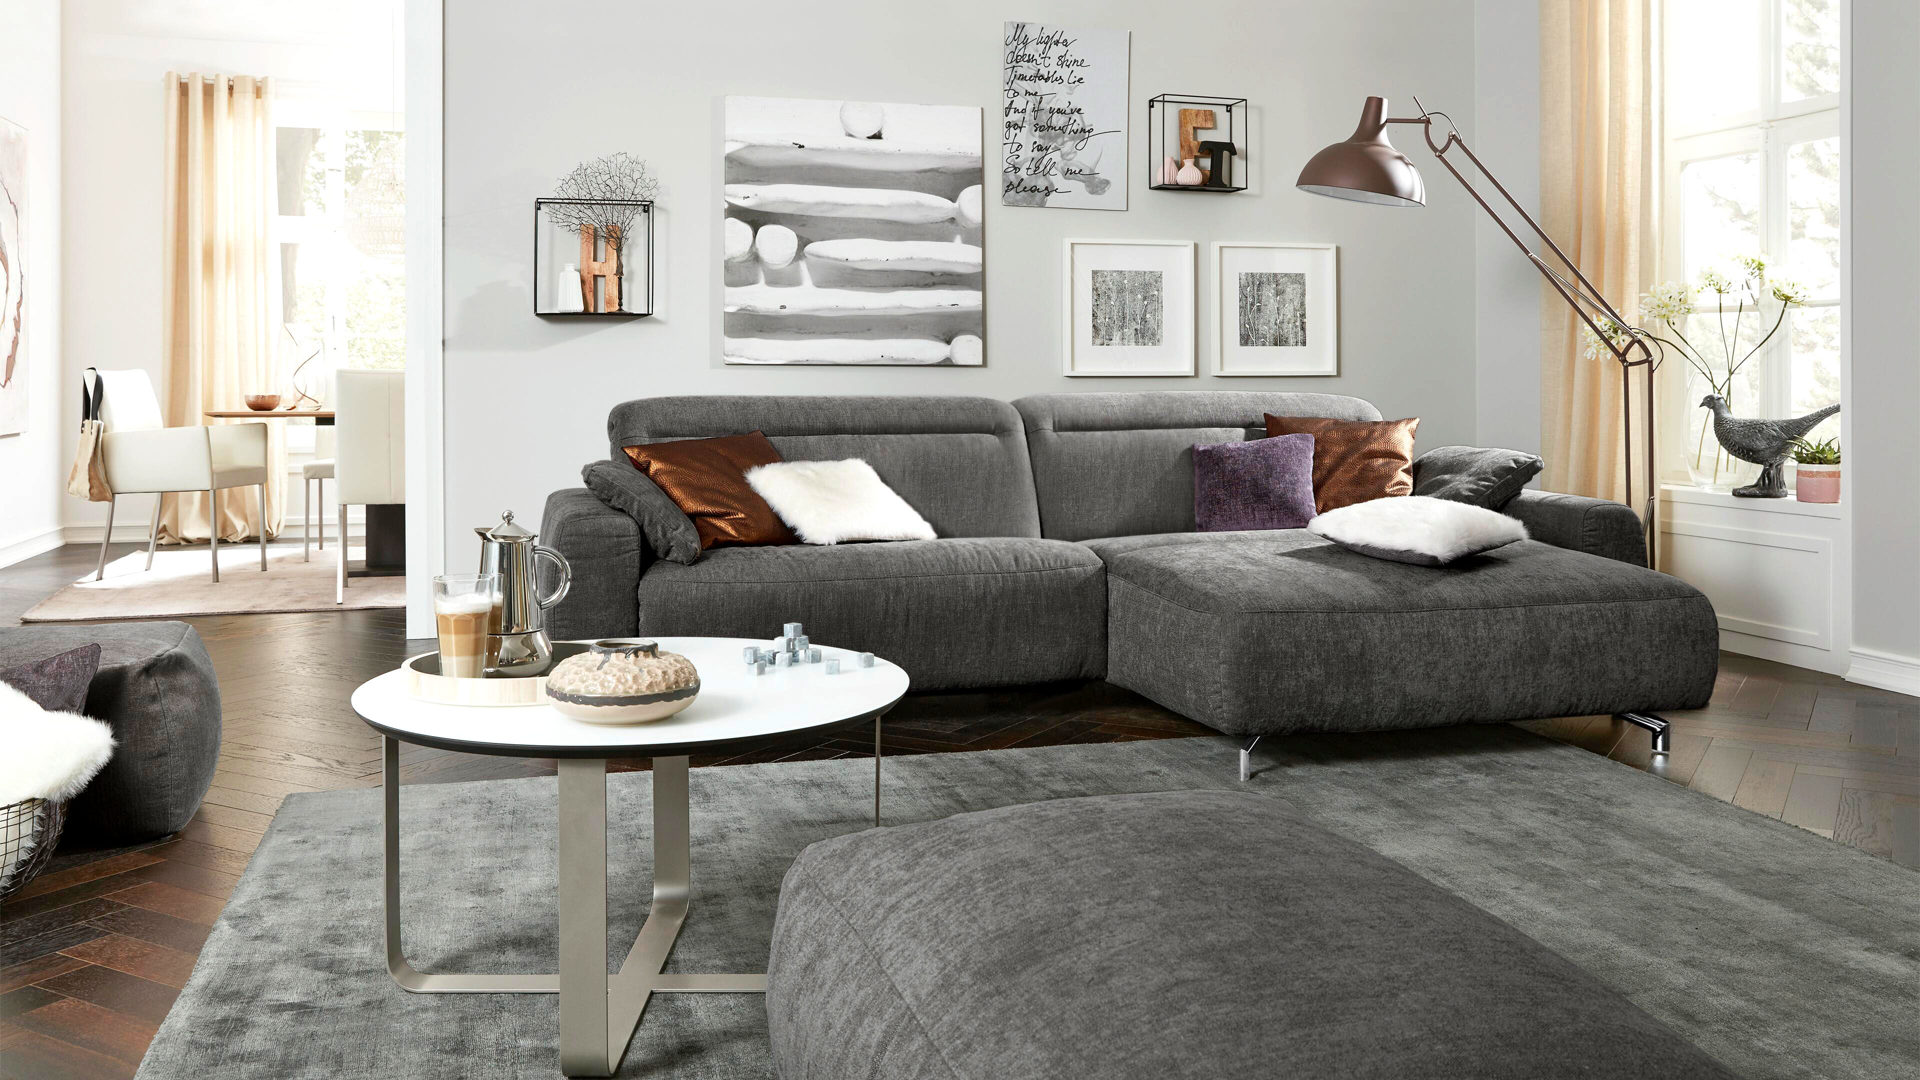 interliving sofa serie 4151 eckkombination